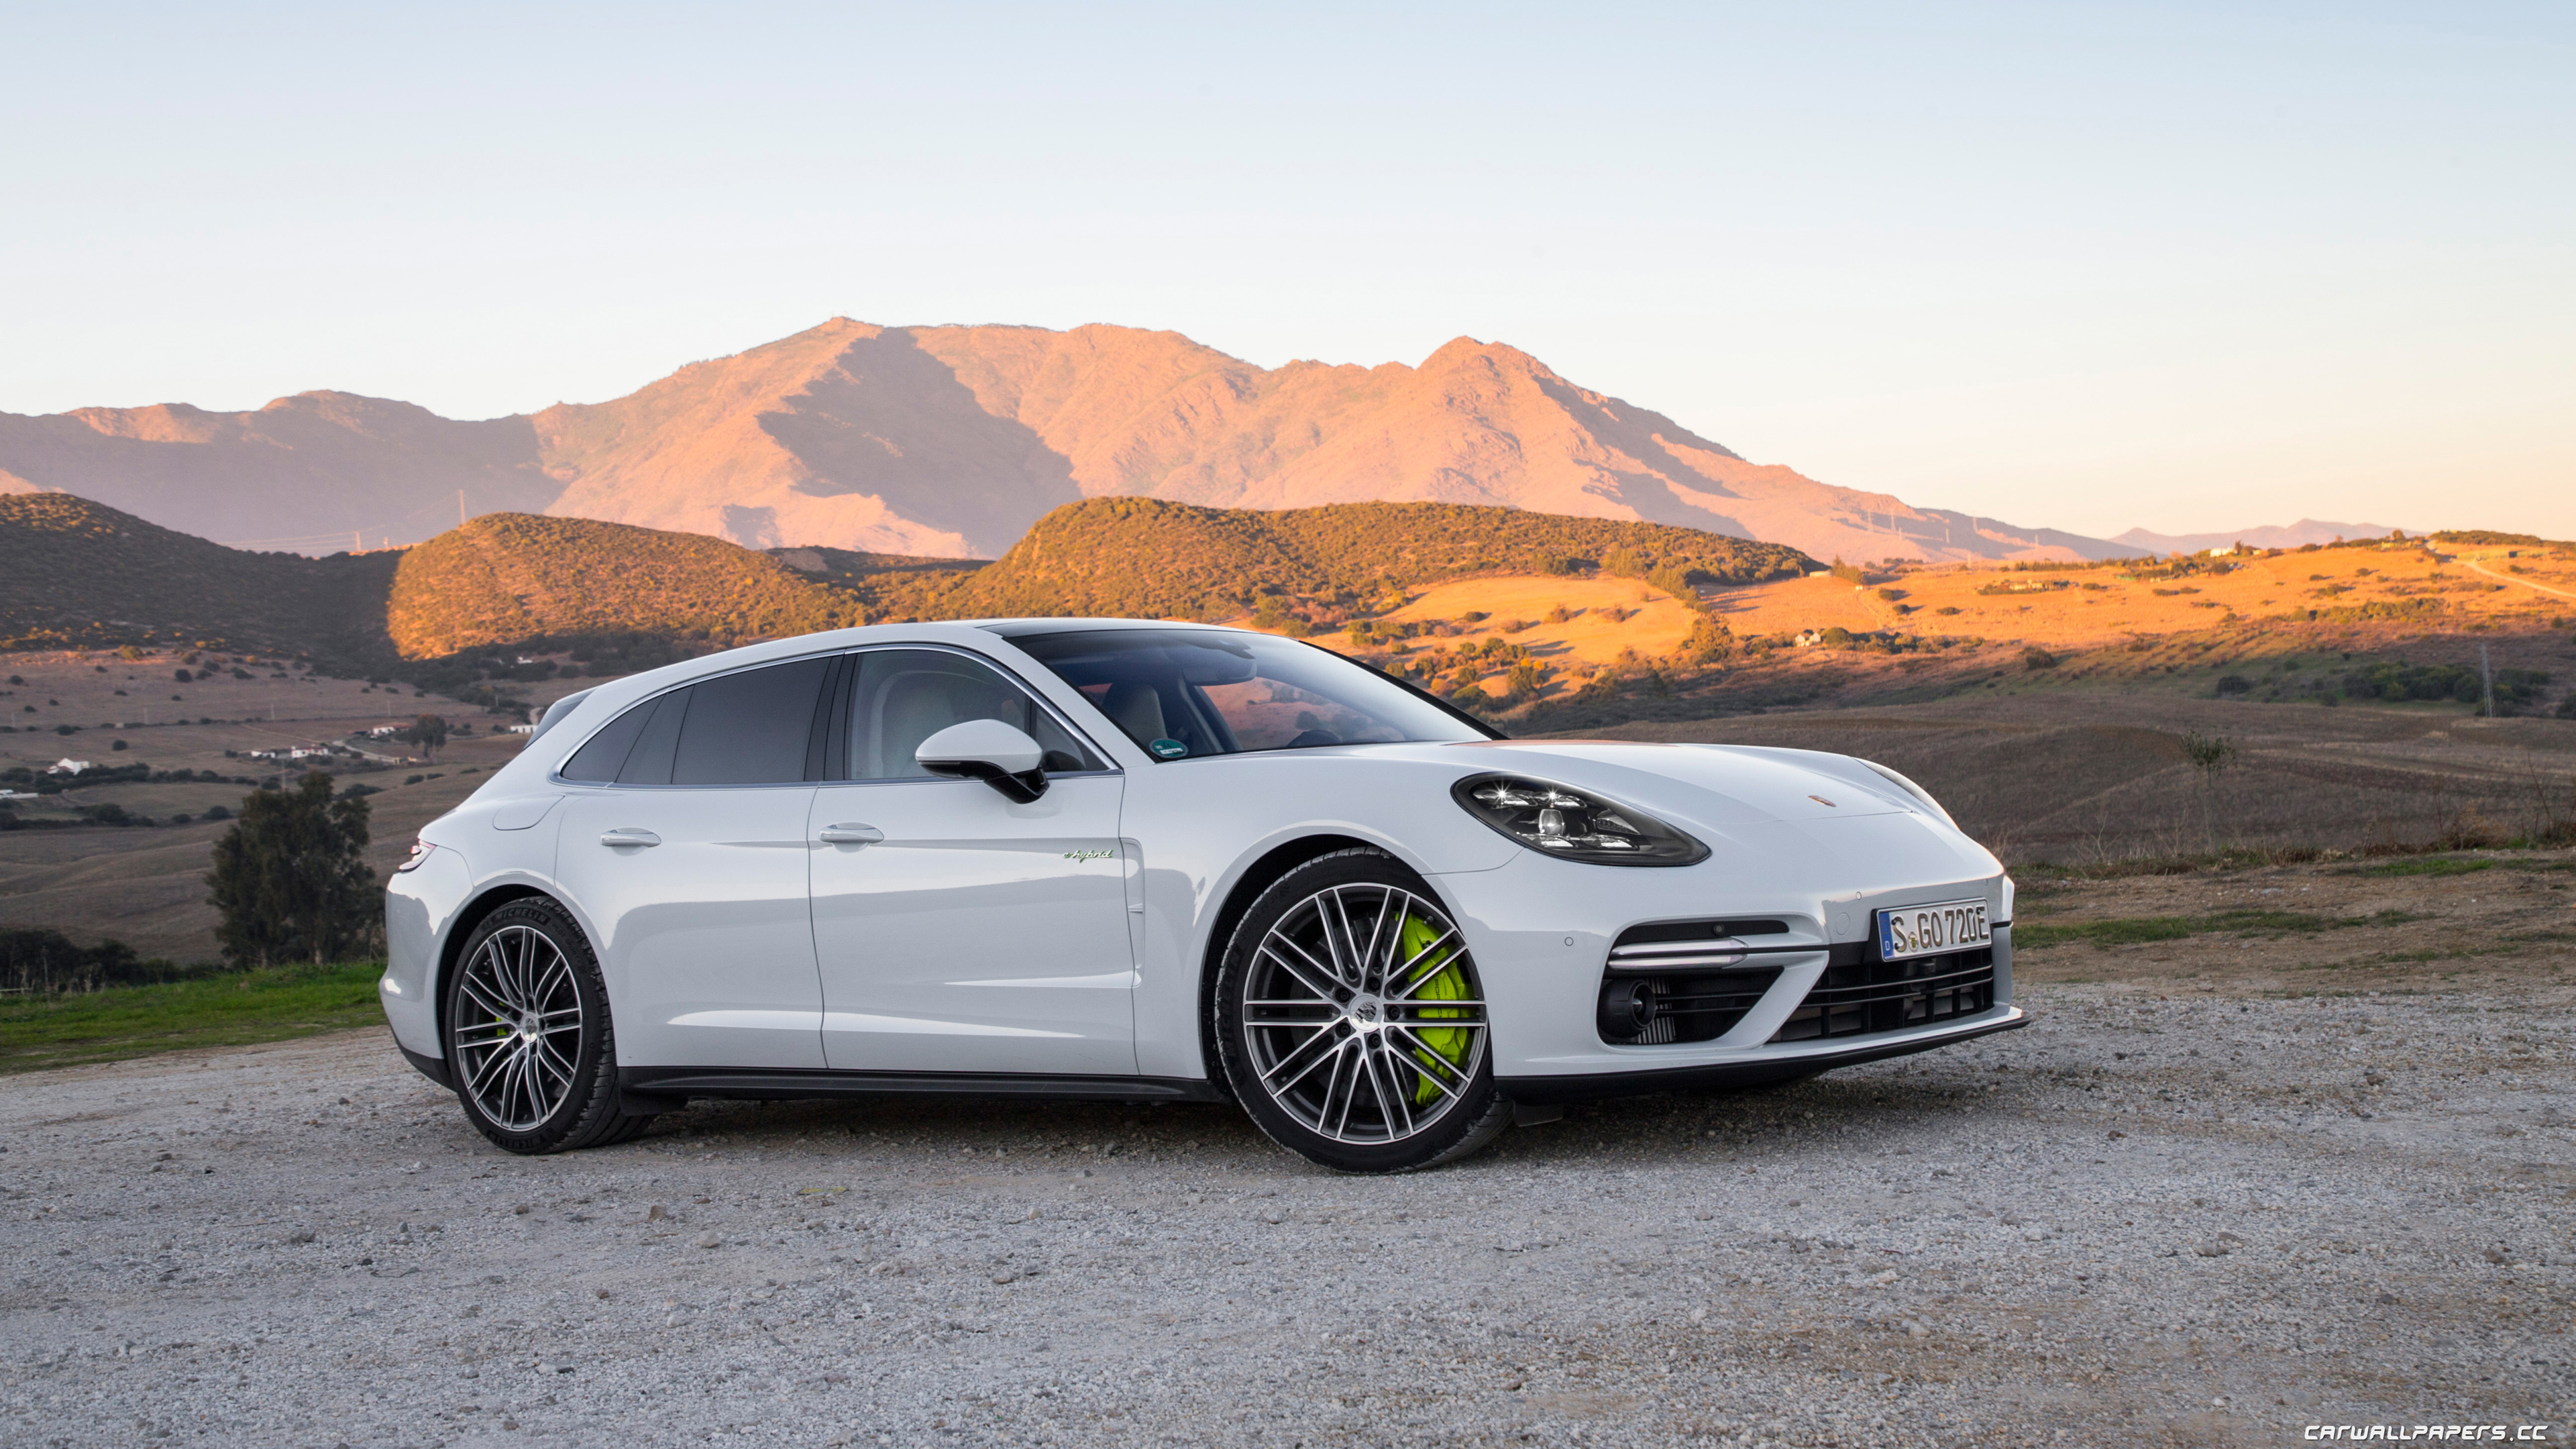 Cars Desktop Wallpapers Porsche Panamera Turbo S E Hybrid Sport Turismo Carrara White Metallic 2017